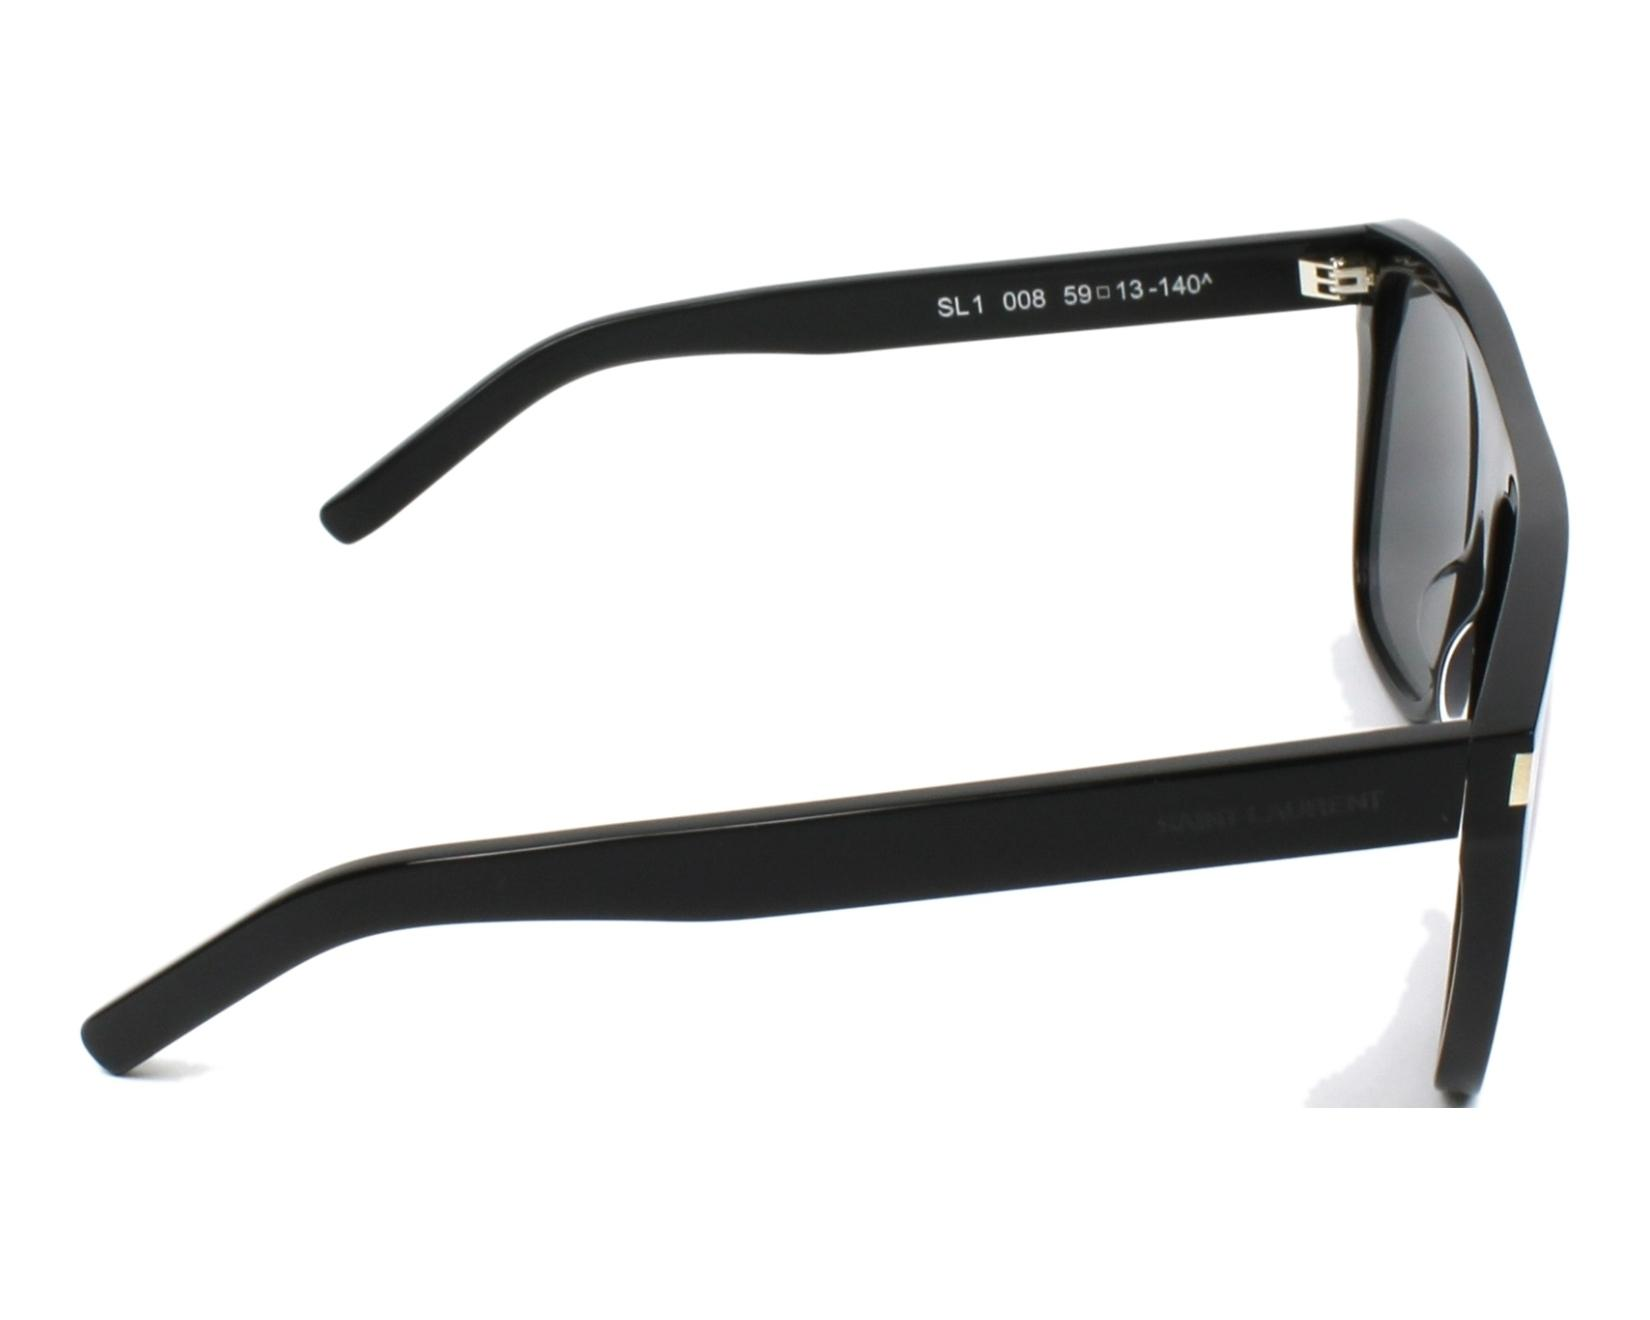 3cd9045e7e0f Sunglasses Yves Saint Laurent SL-1 008 59-13 Black side view